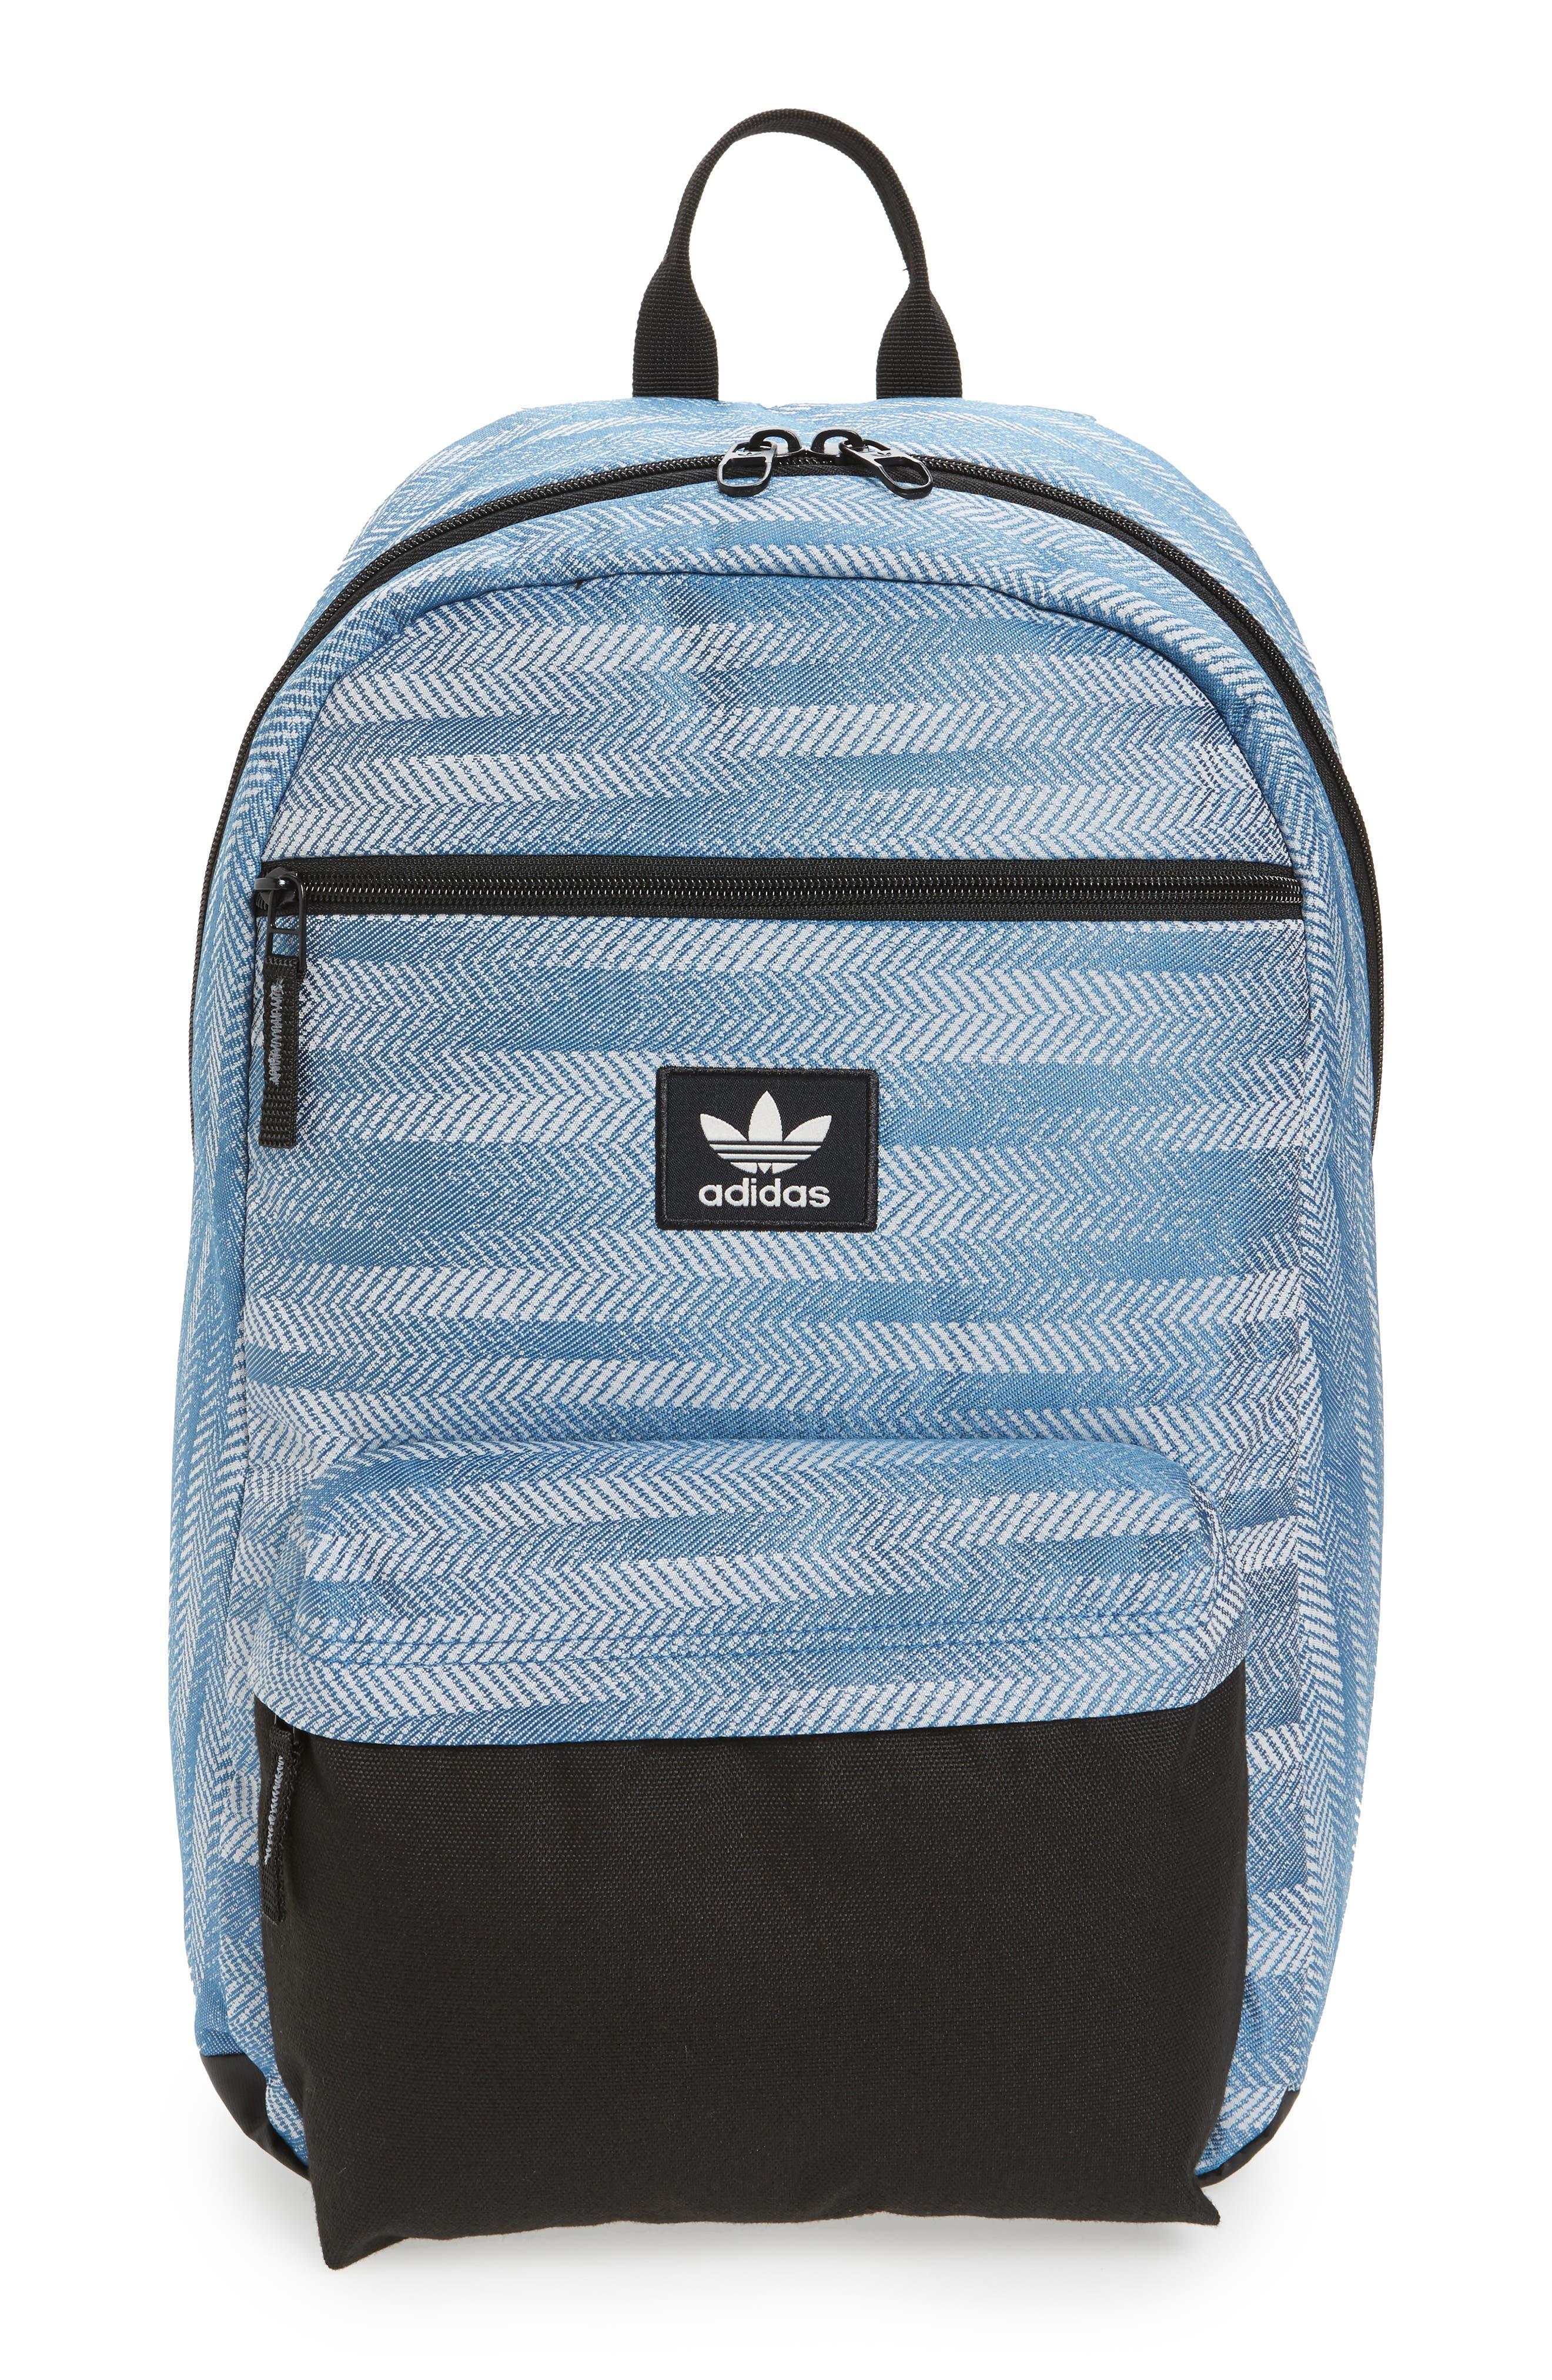 NTL Plus Backpack,                         Main,                         color, CORE BLUE/ BLACK